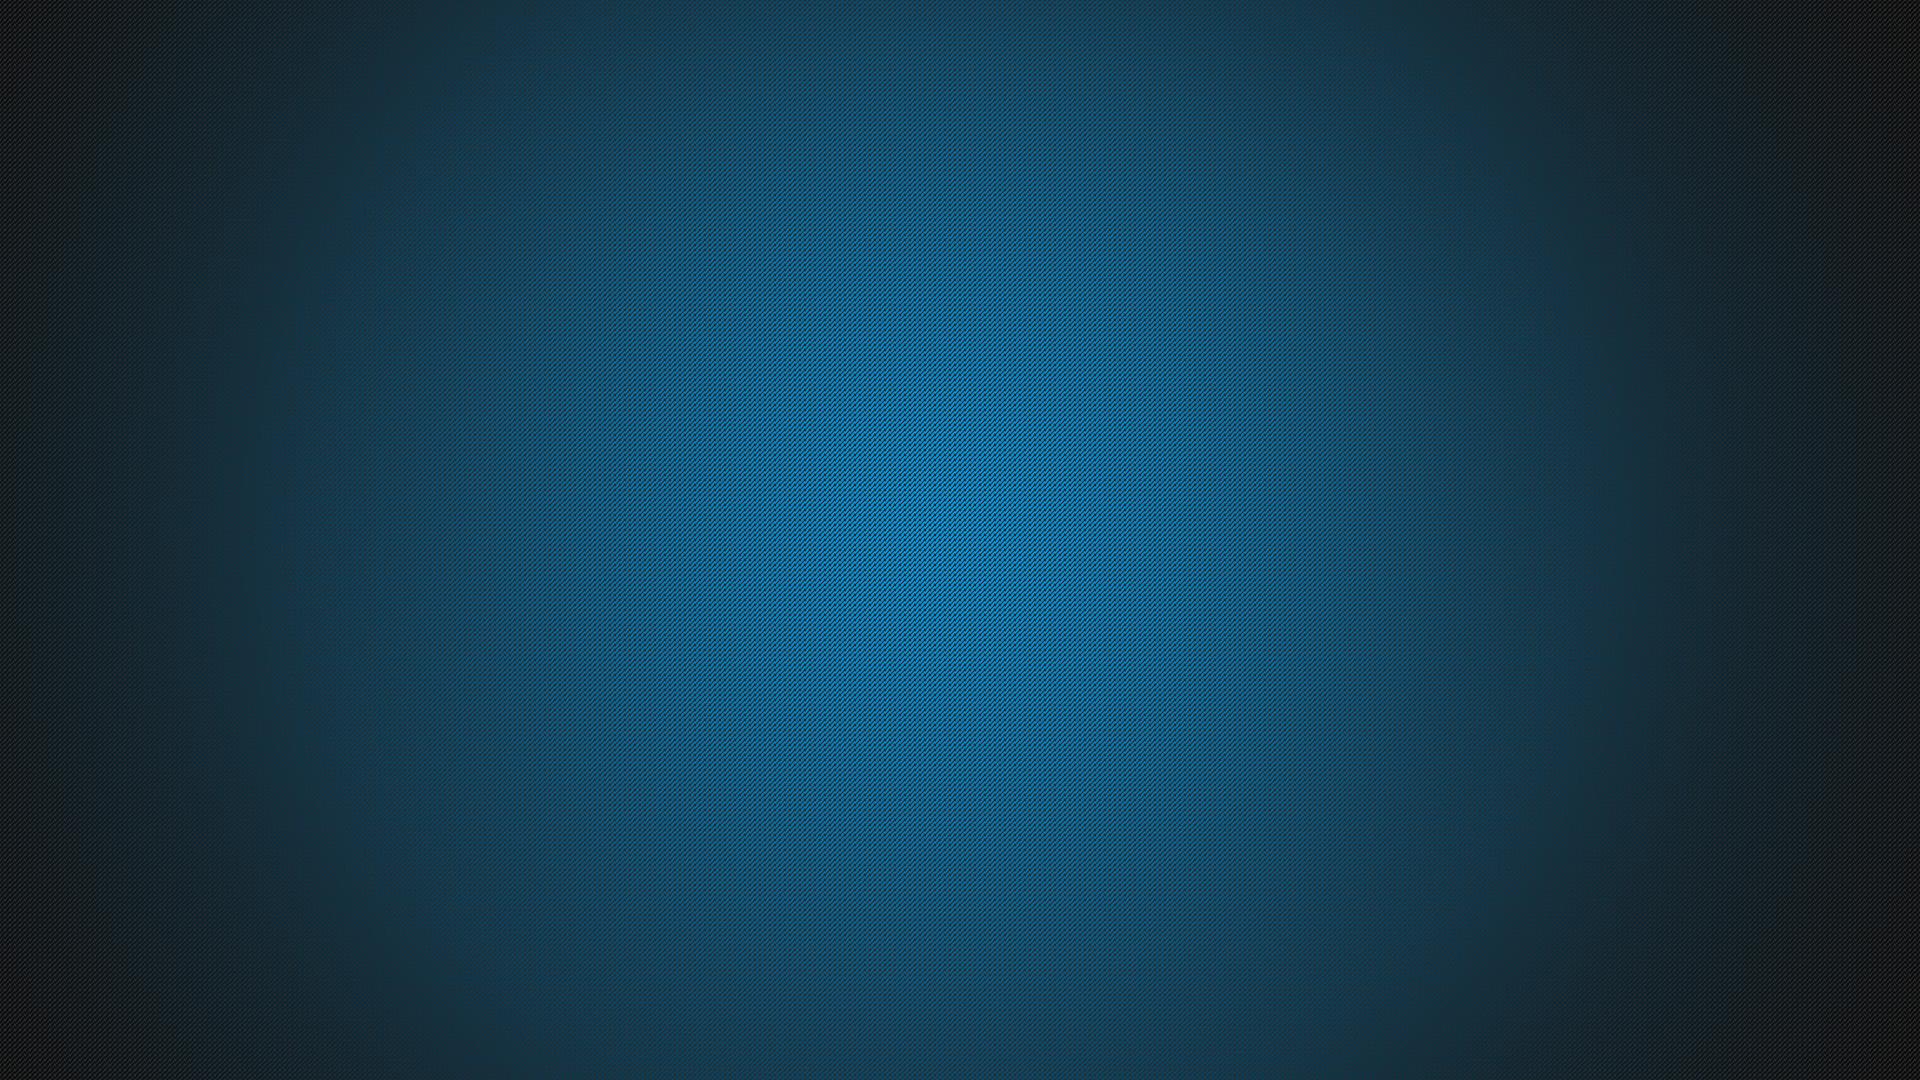 Black and Blue Wallpaper by phantomghost1525 Black and Blue  Wallpaper by phantomghost1525